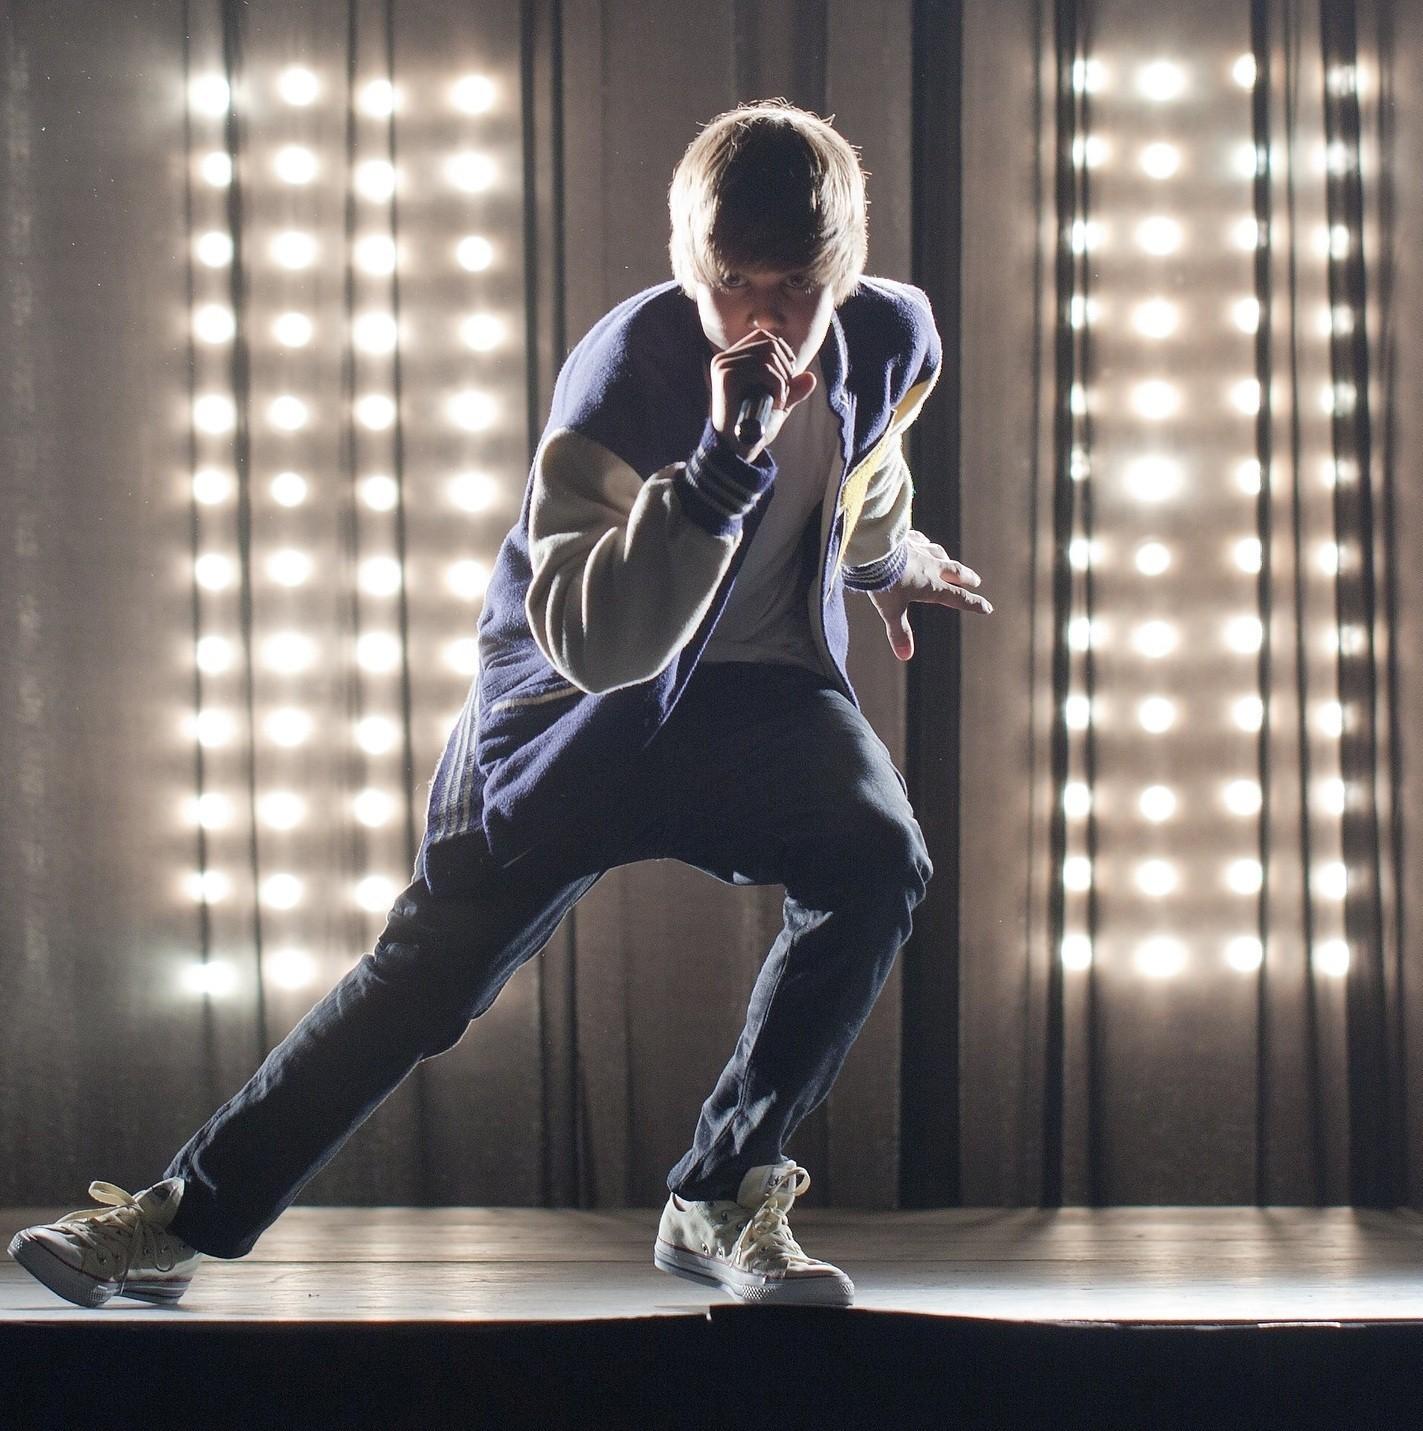 9f78da19a683 Justin Bieber set for show at Philadelphia s Wells Fargo Center - The  Morning Call